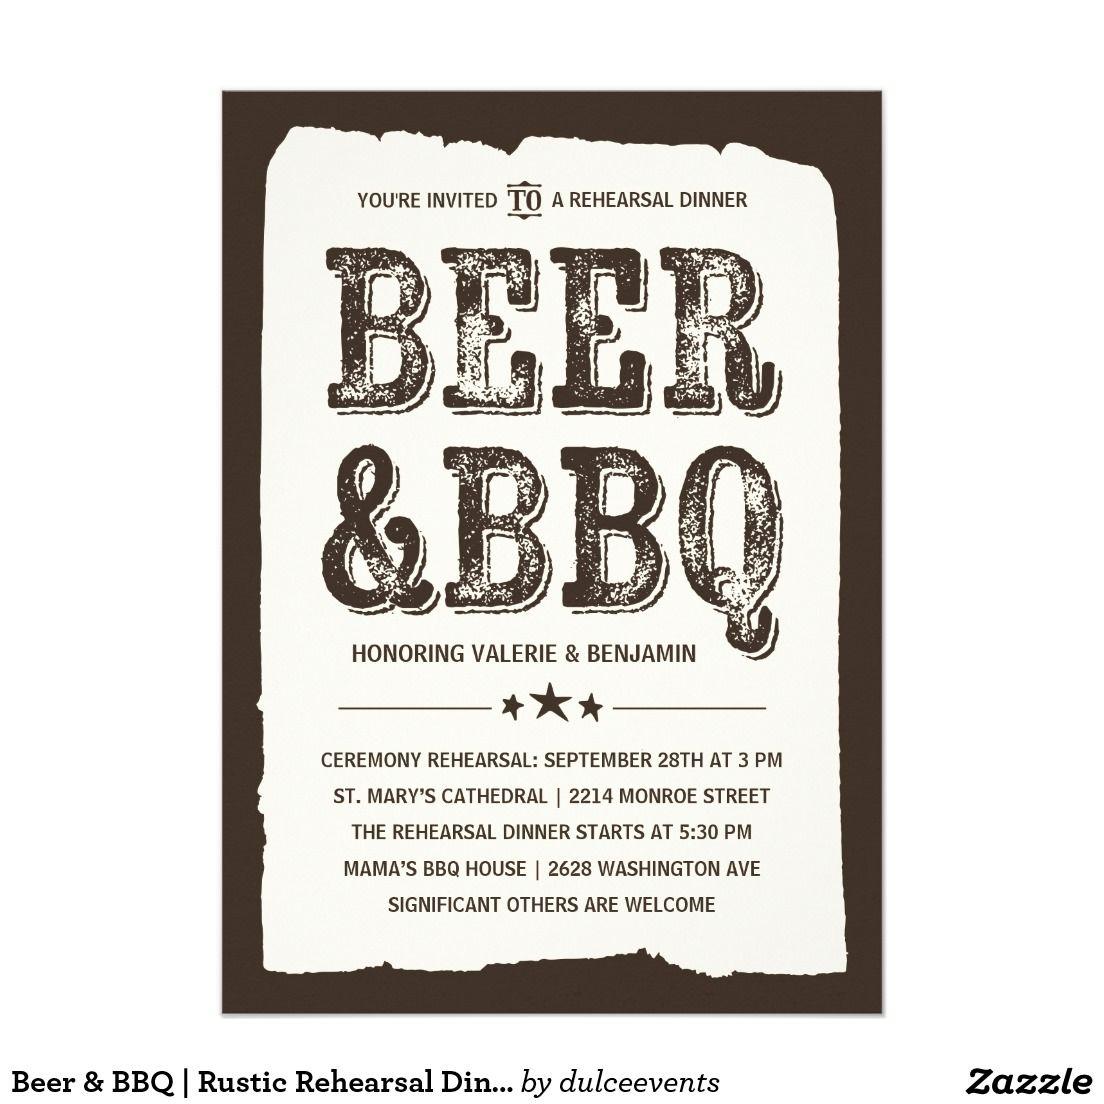 Beer & BBQ | Rustic Rehearsal Dinner Card | Rustic rehearsal dinners